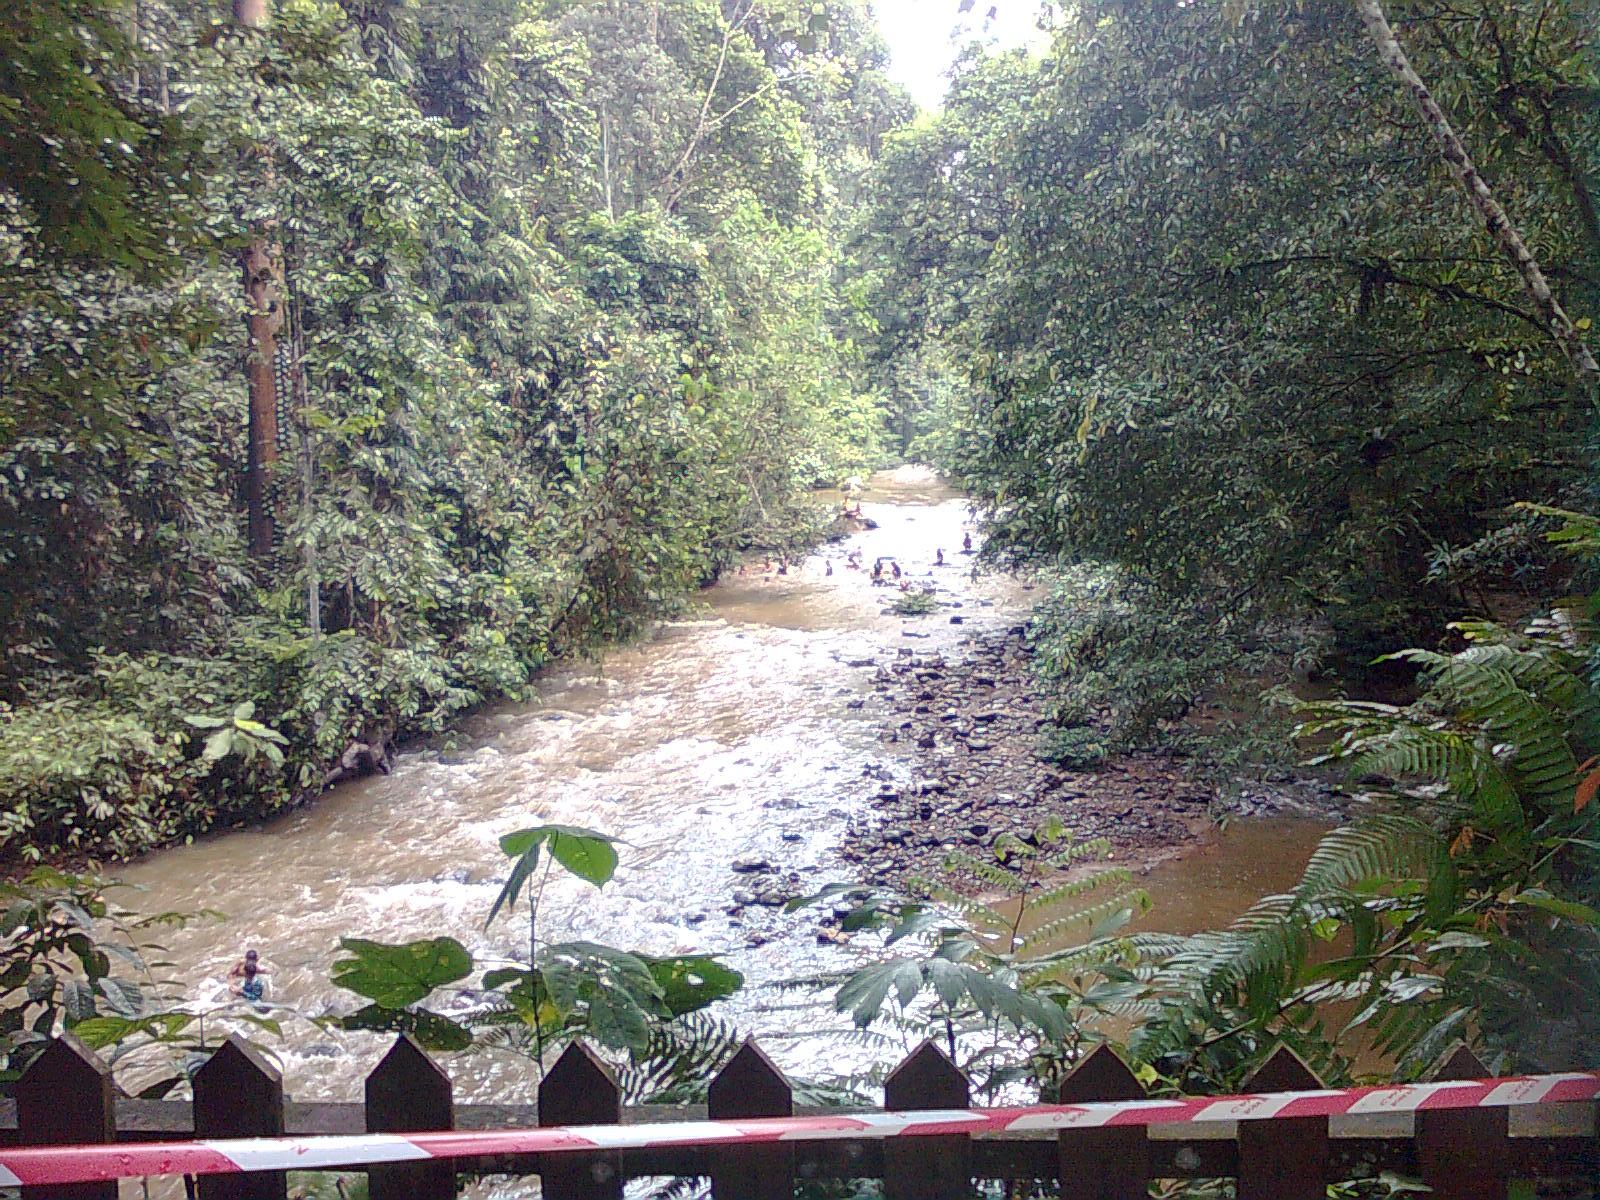 Kancil 8349 Jalan  Jalan Ke Taman Bukit Tawau